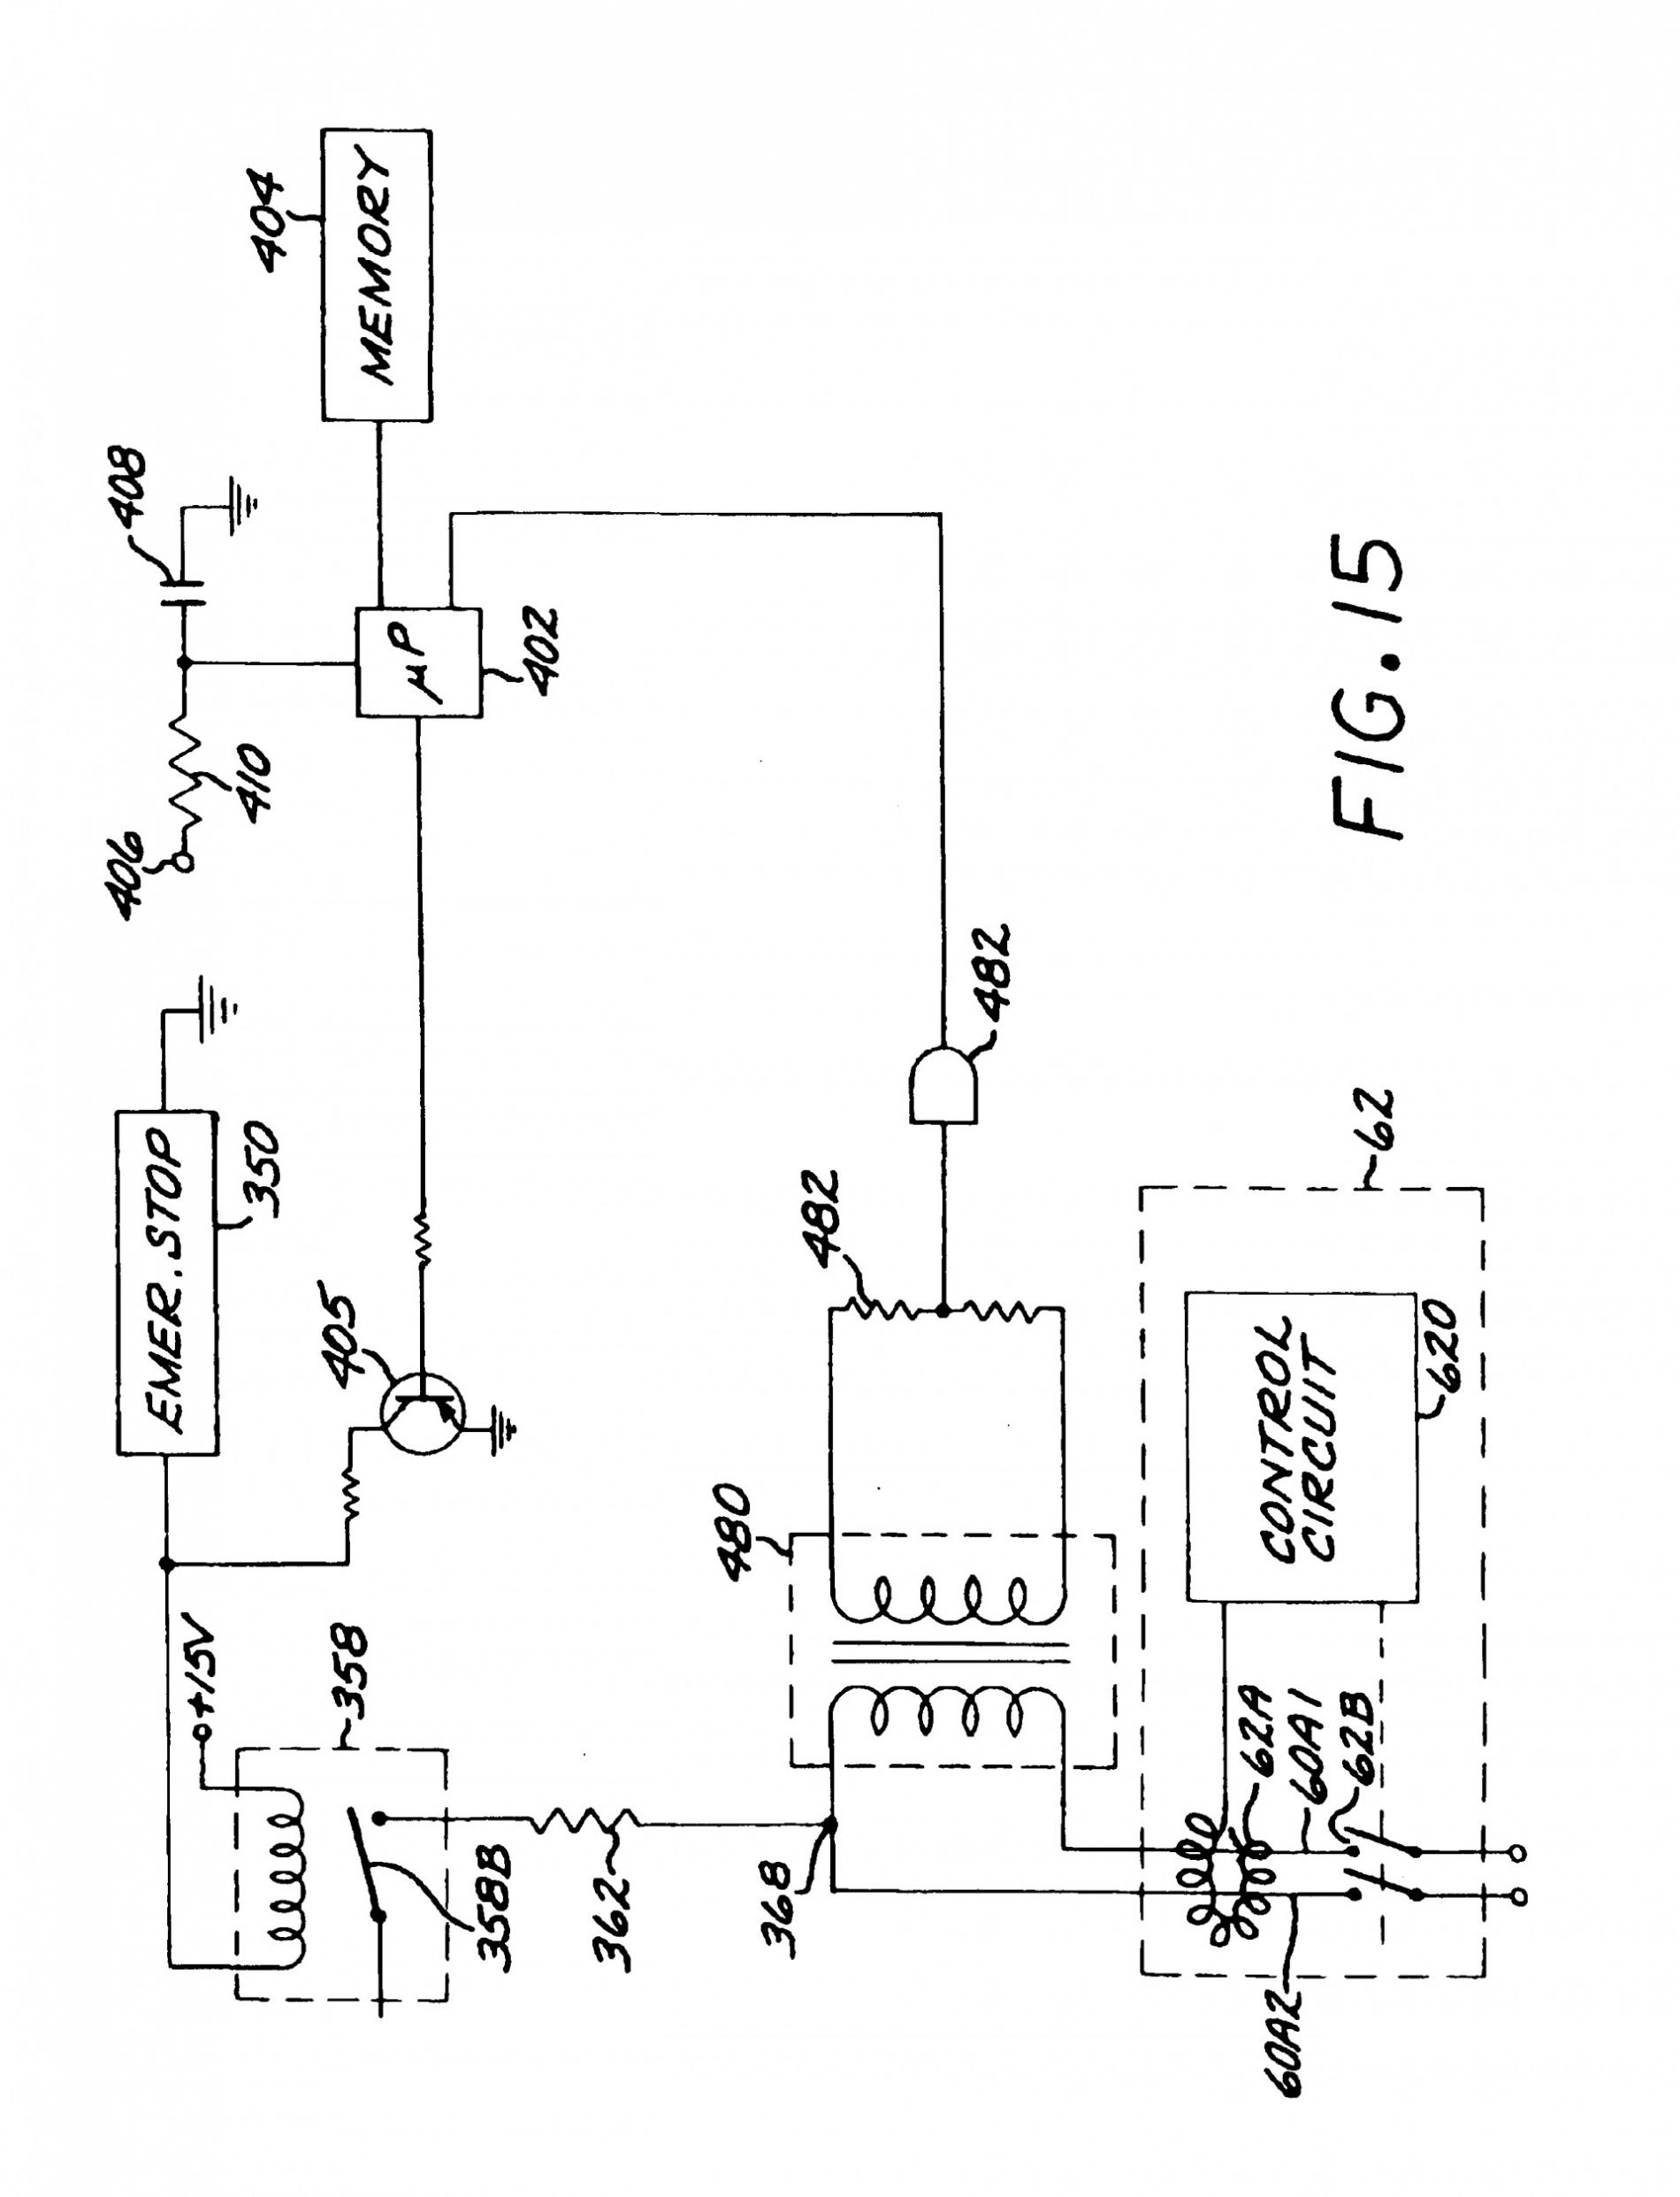 White Rodgers Gas Valve Wiring Diagram